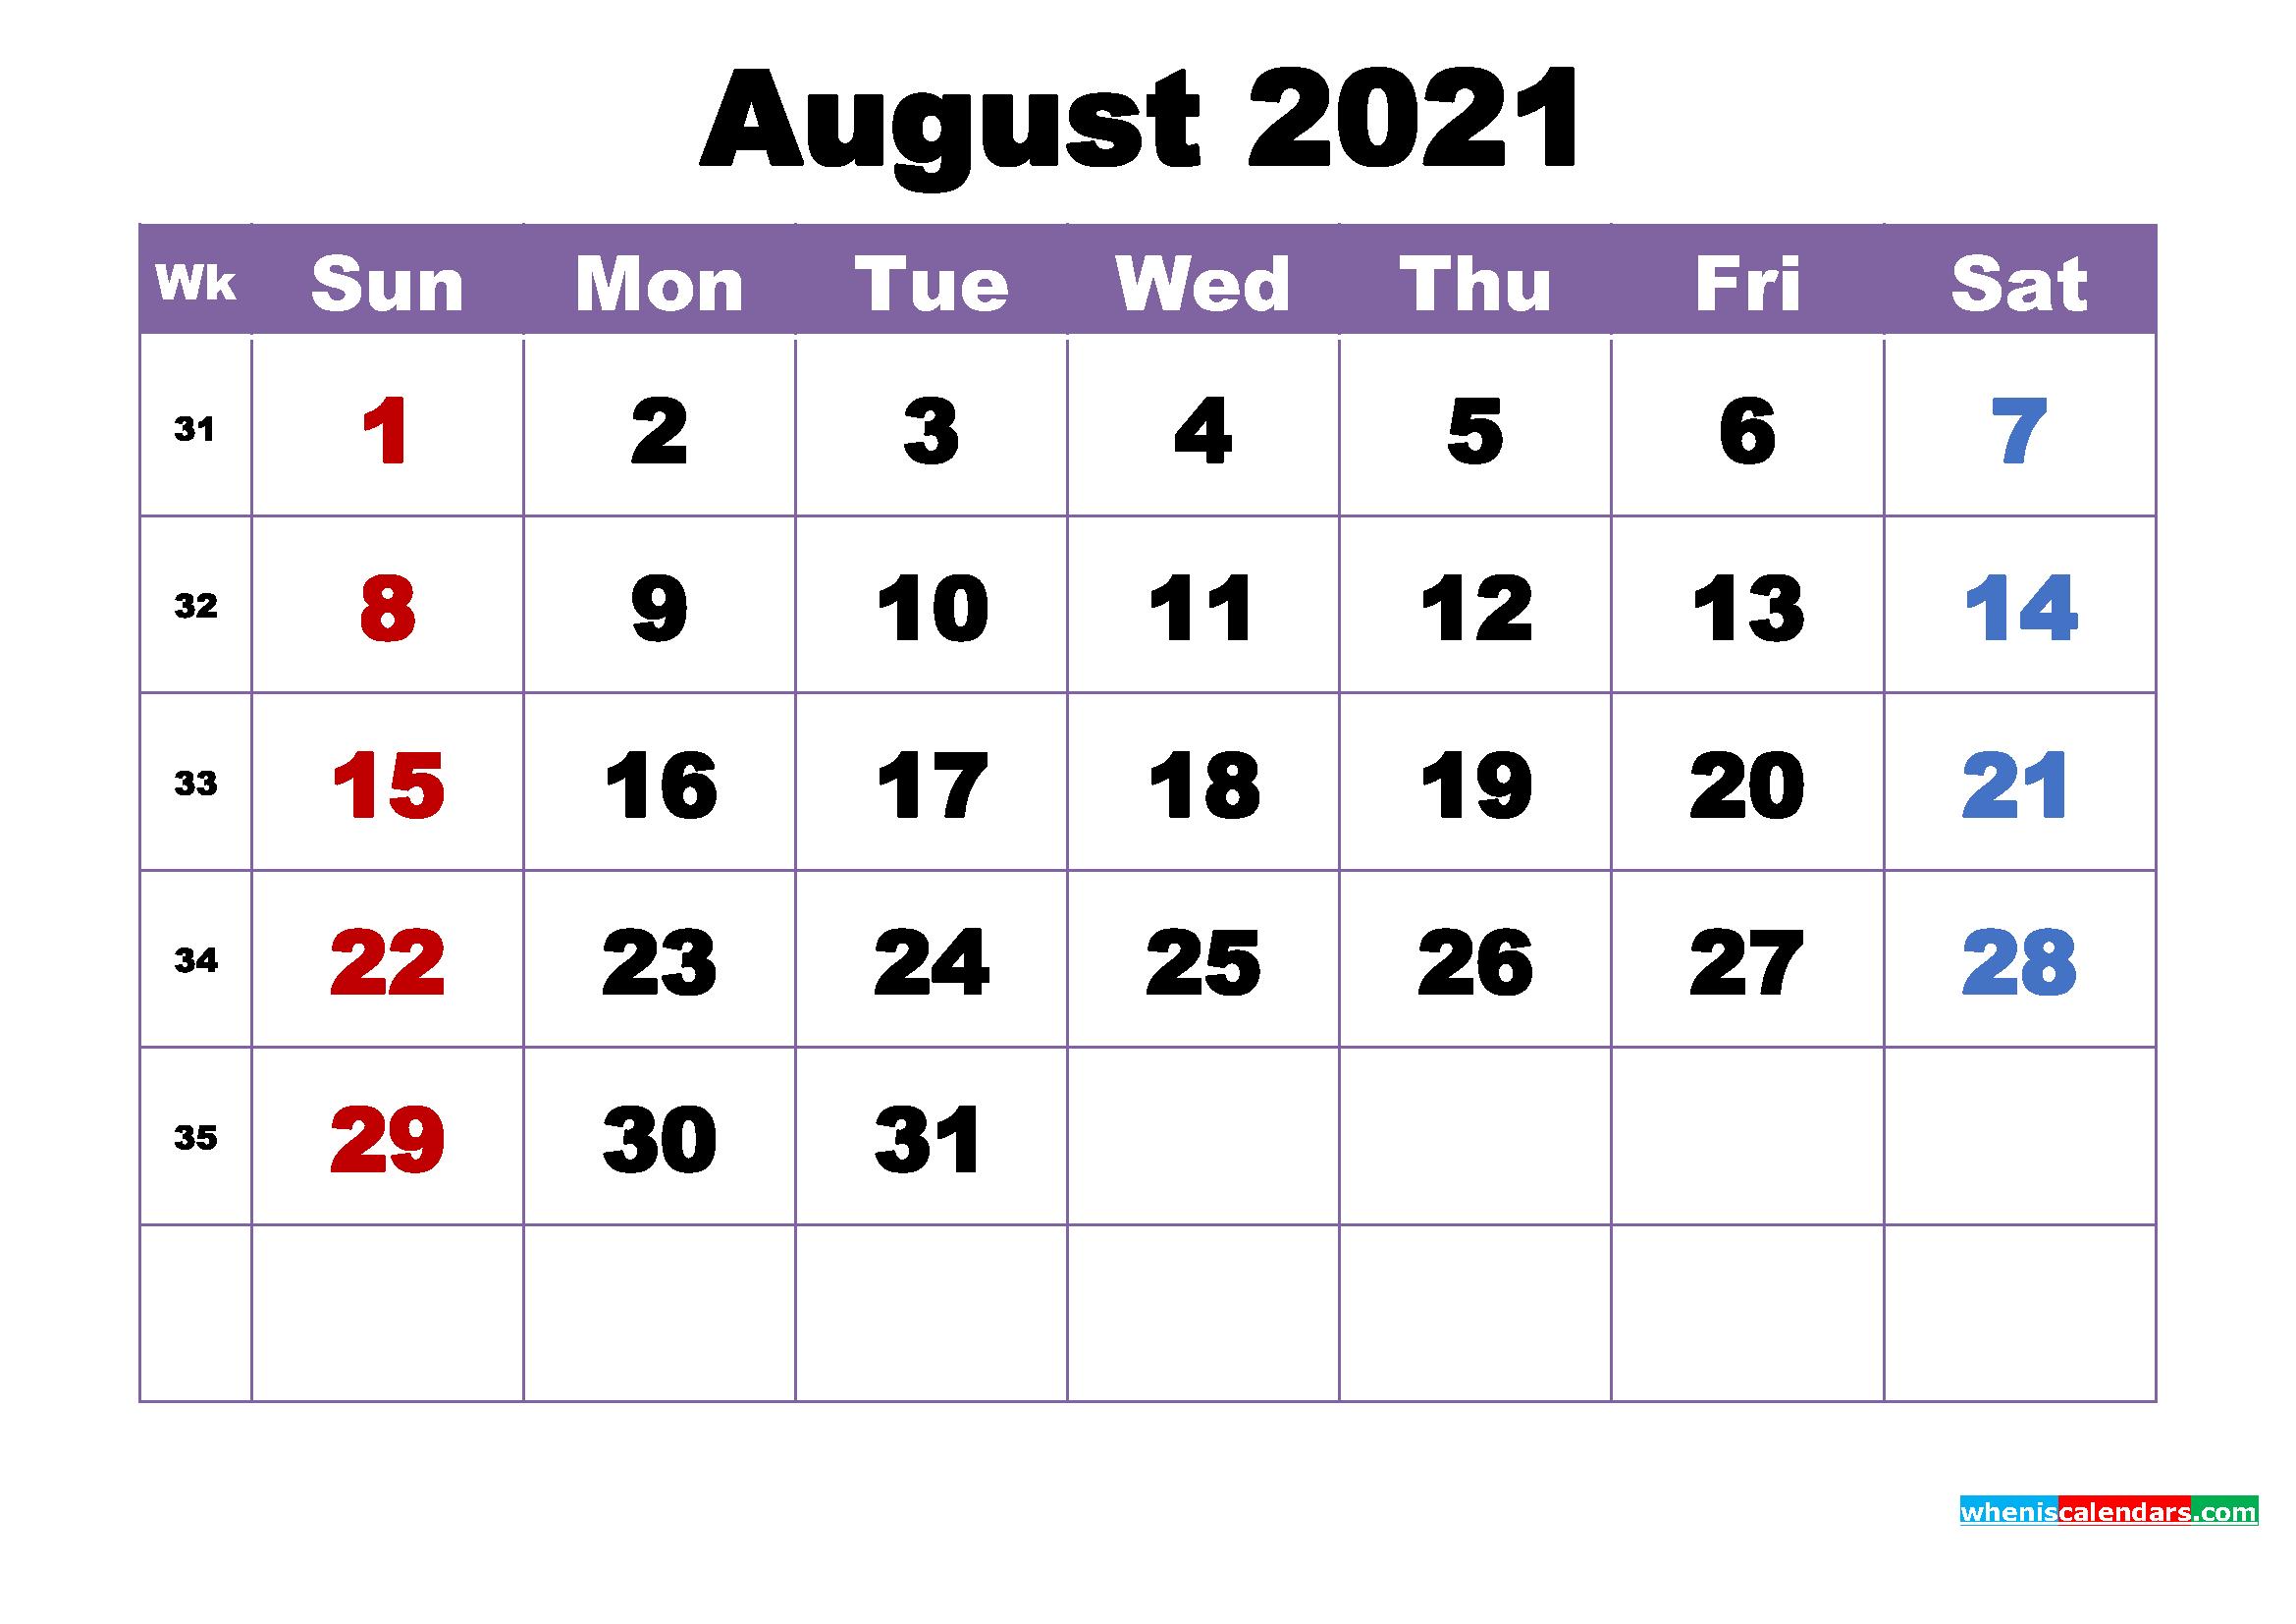 August 2021 Printable Calendar with Holidays Word, PDF ...